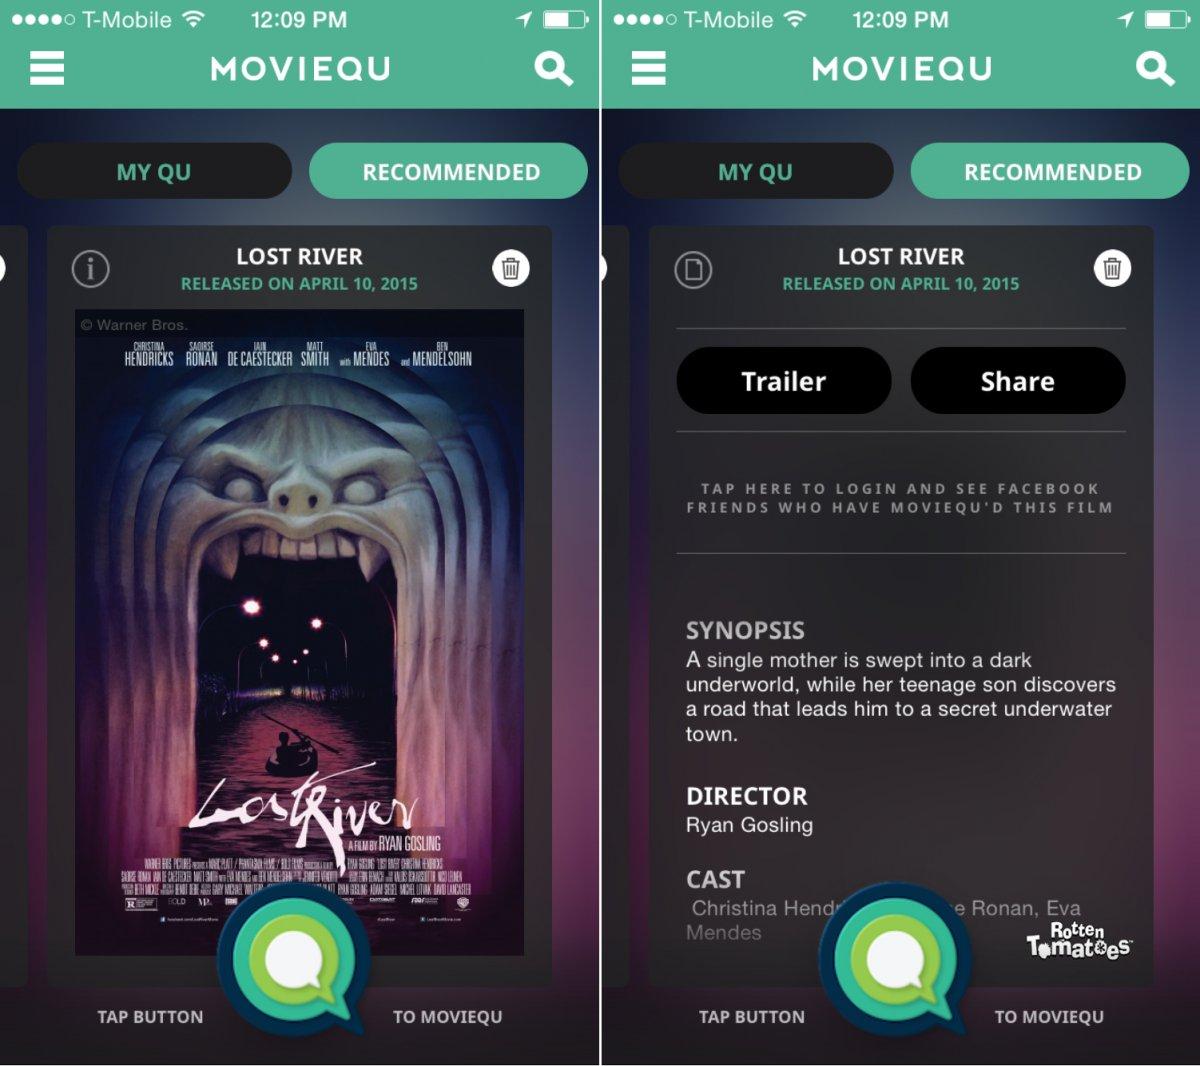 moviequ-is-basically-shazam-for-movie-trailers